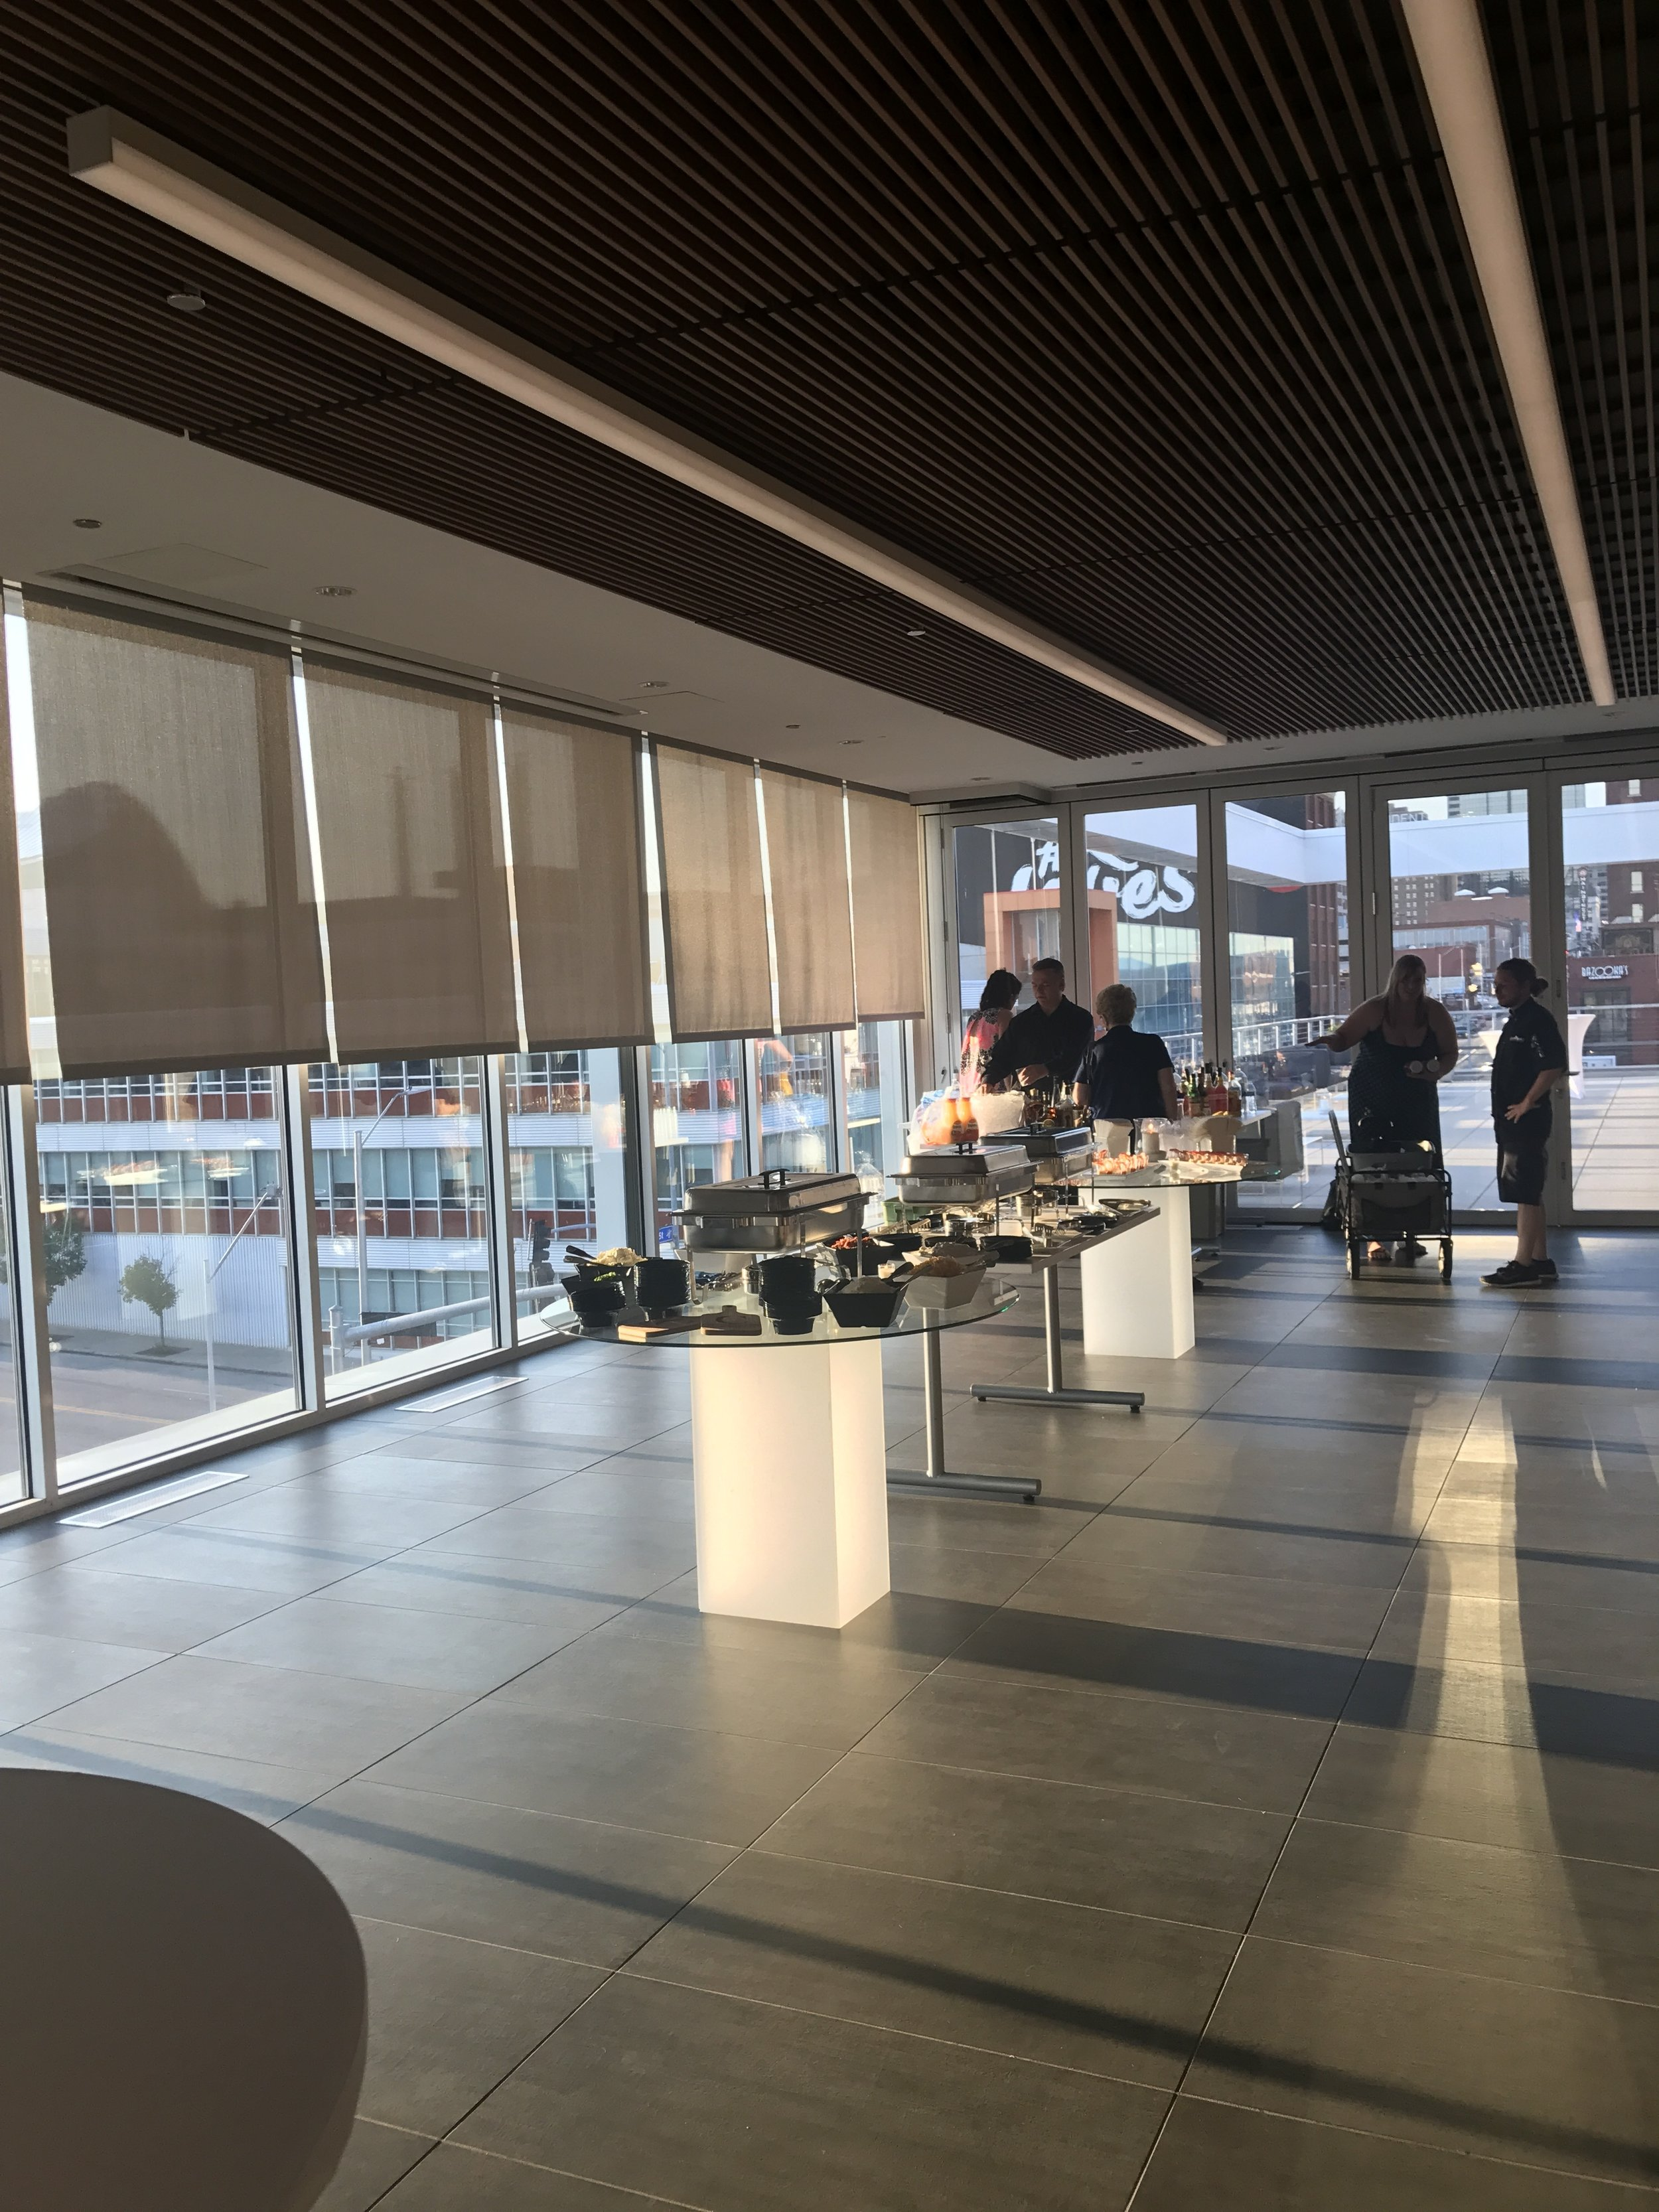 box-lunches-breakfast-buffett-appetizers-full-buffett-office-catering-lenexa-mission-hills-plaza-kcmo-organic3.jpg